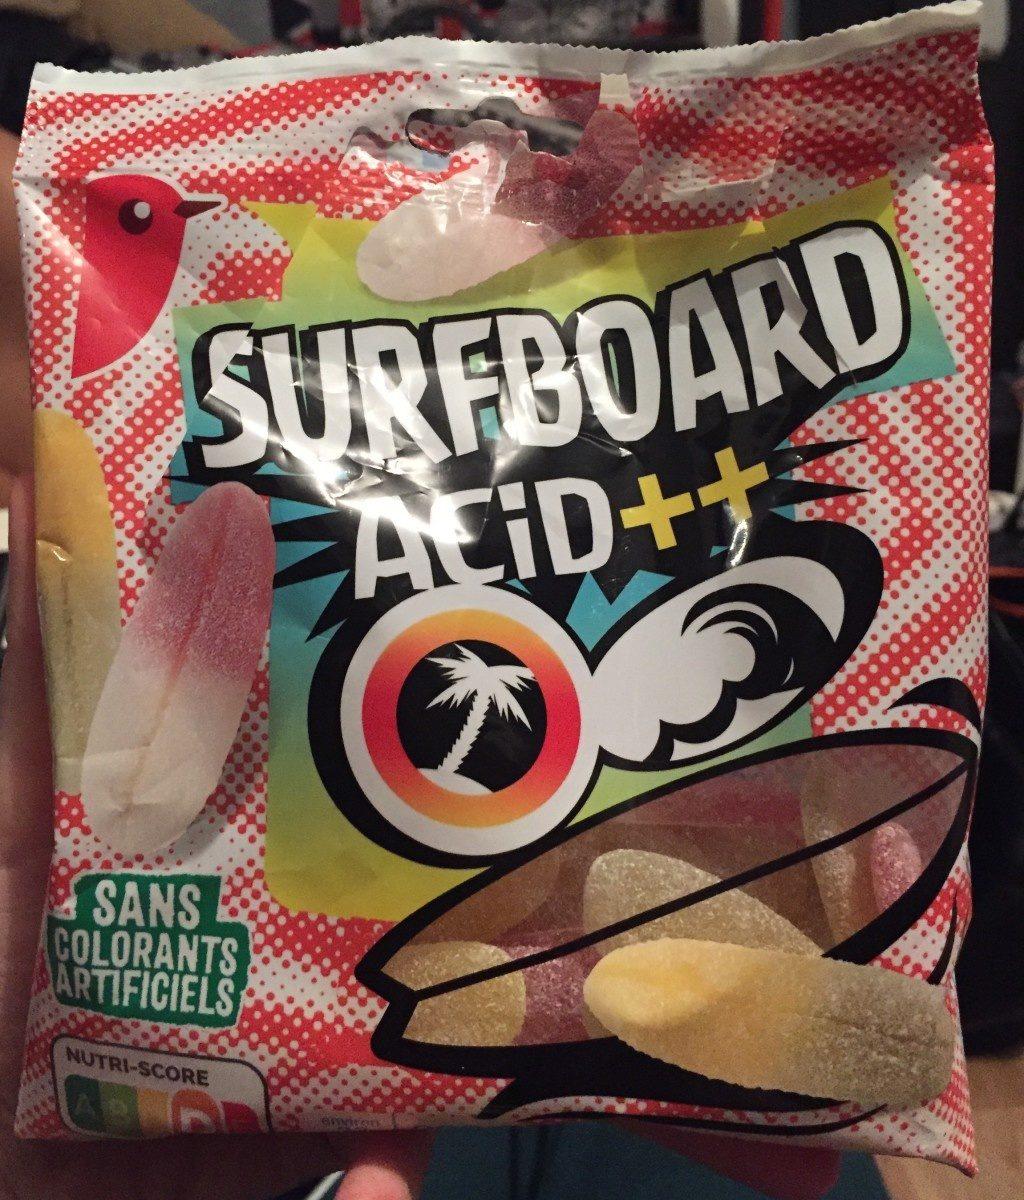 Surfboard acid ++ - Product